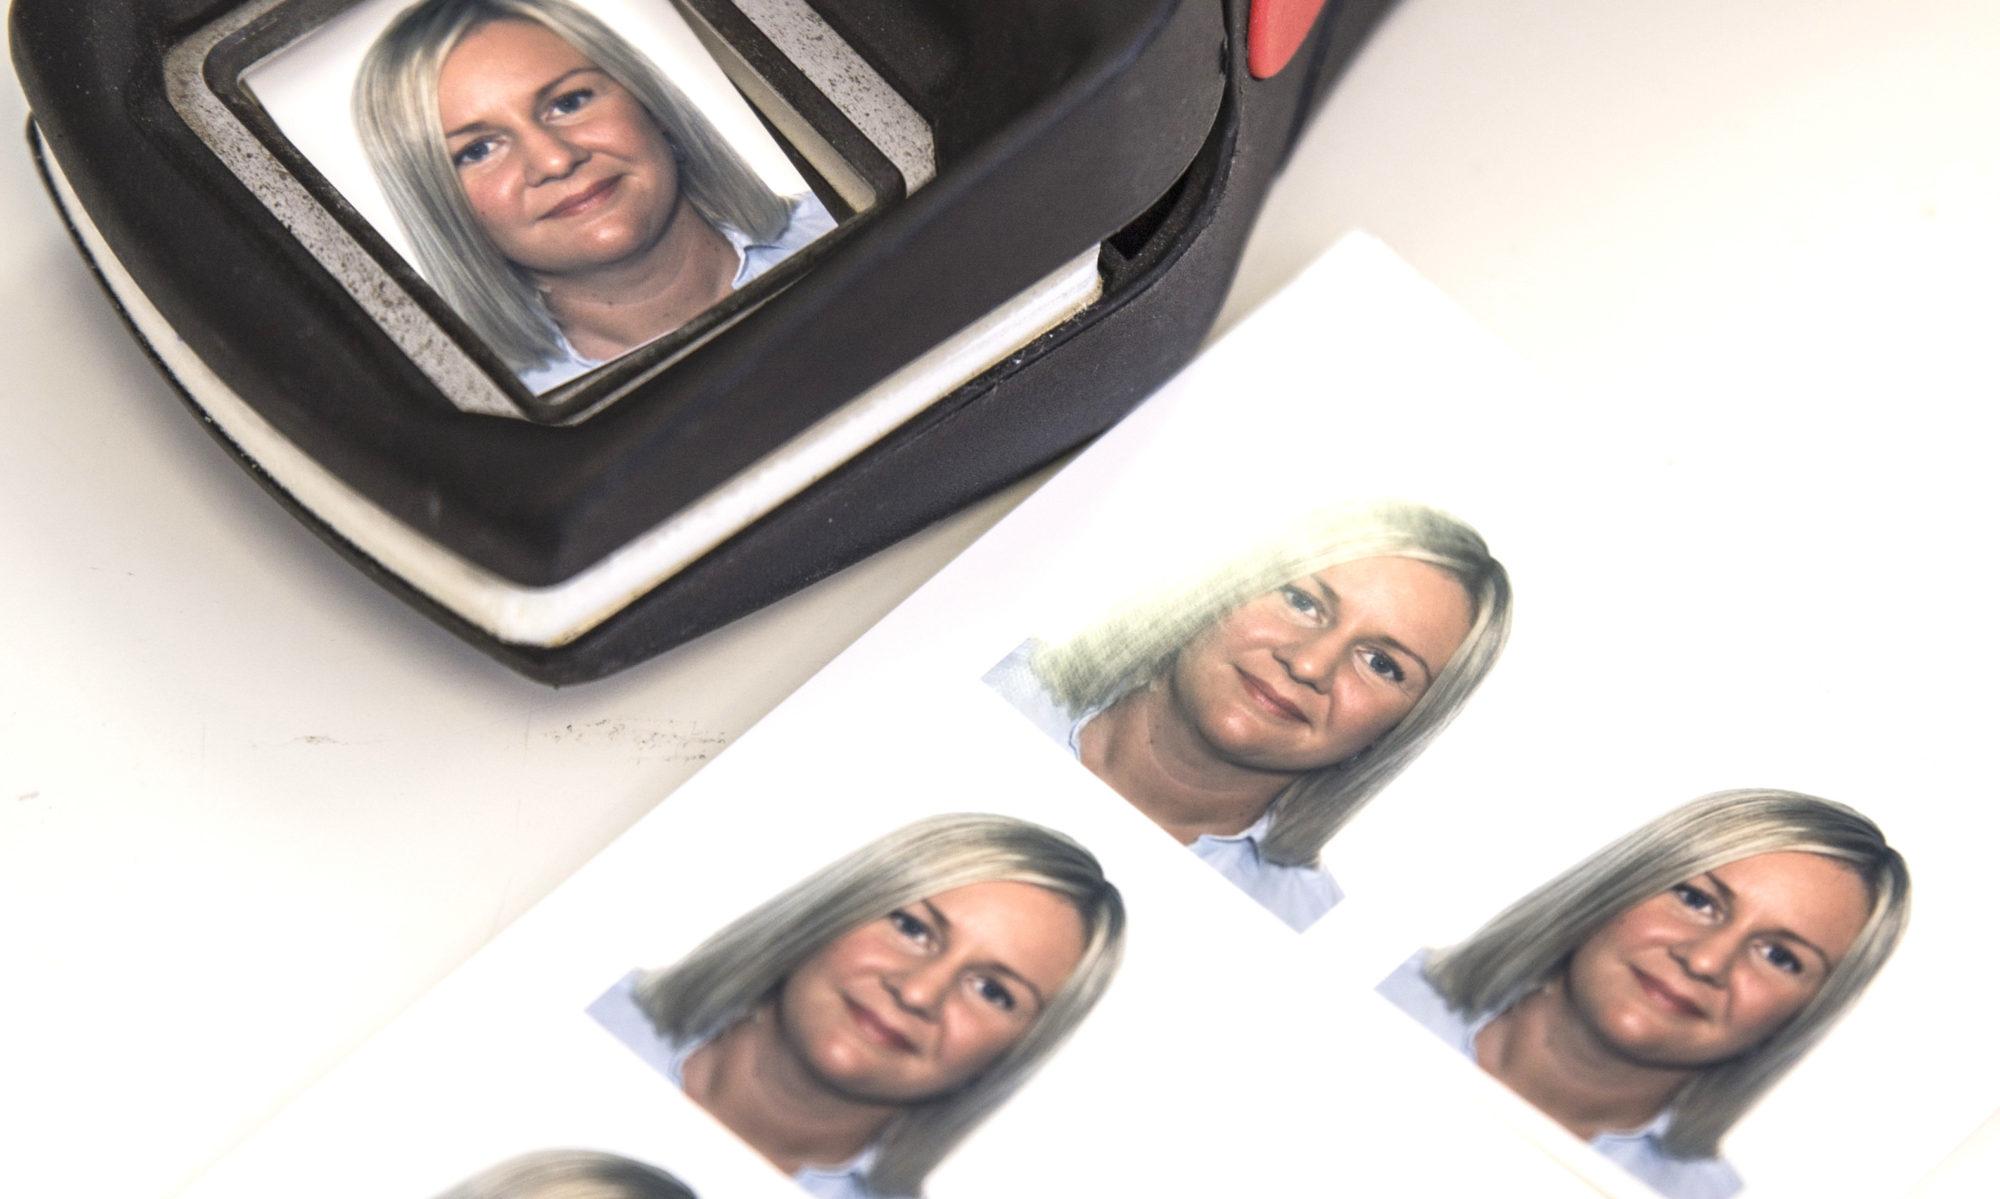 Körkortsfoto - ID foto i Veberöd - Sjöbo